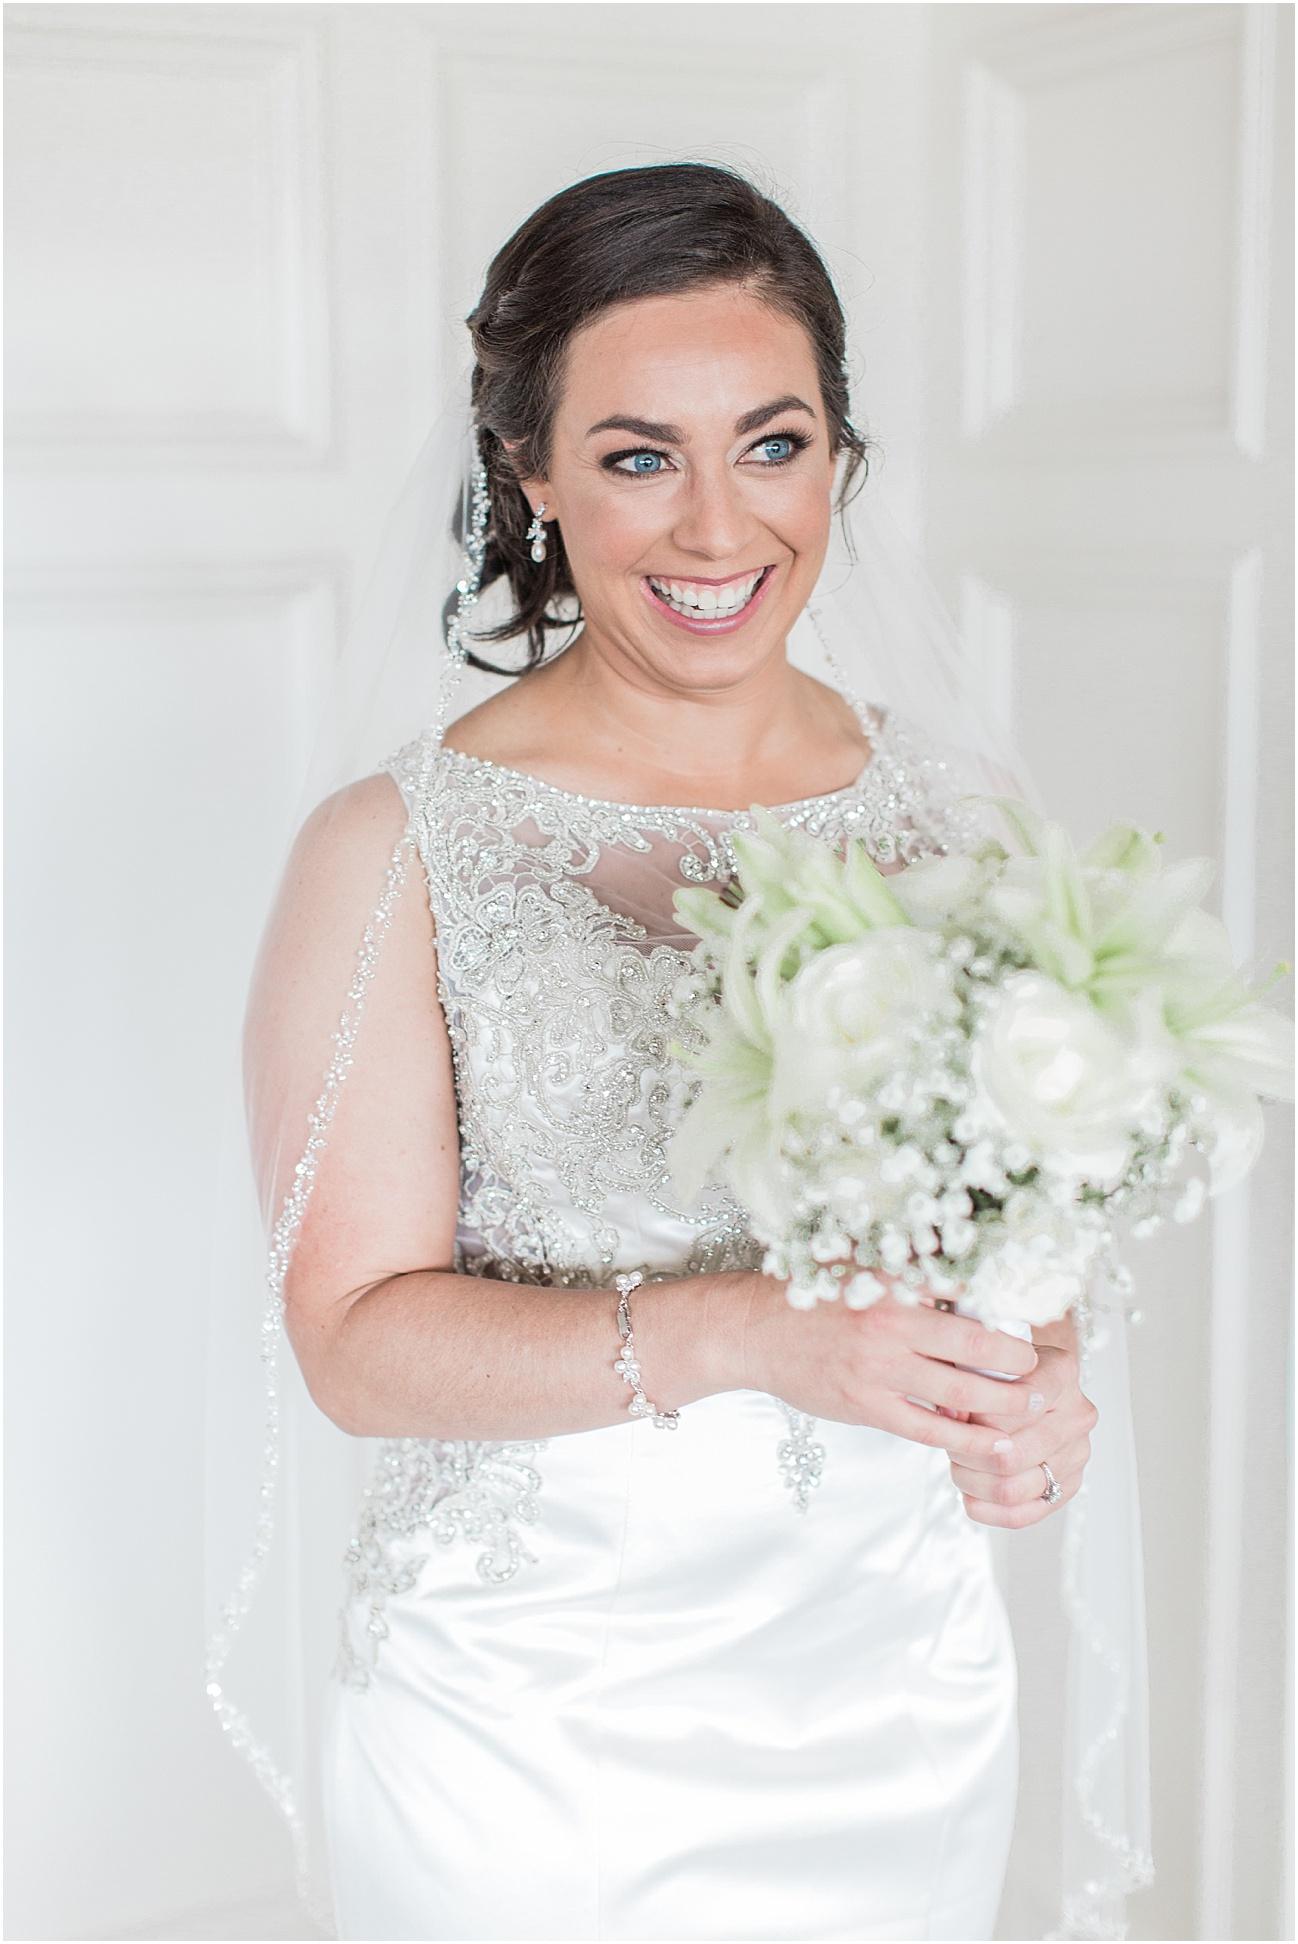 nicole_stephen_cape_club_nicky_falmouth_cod_boston_wedding_photographer_meredith_jane_photography_photo_0173.jpg